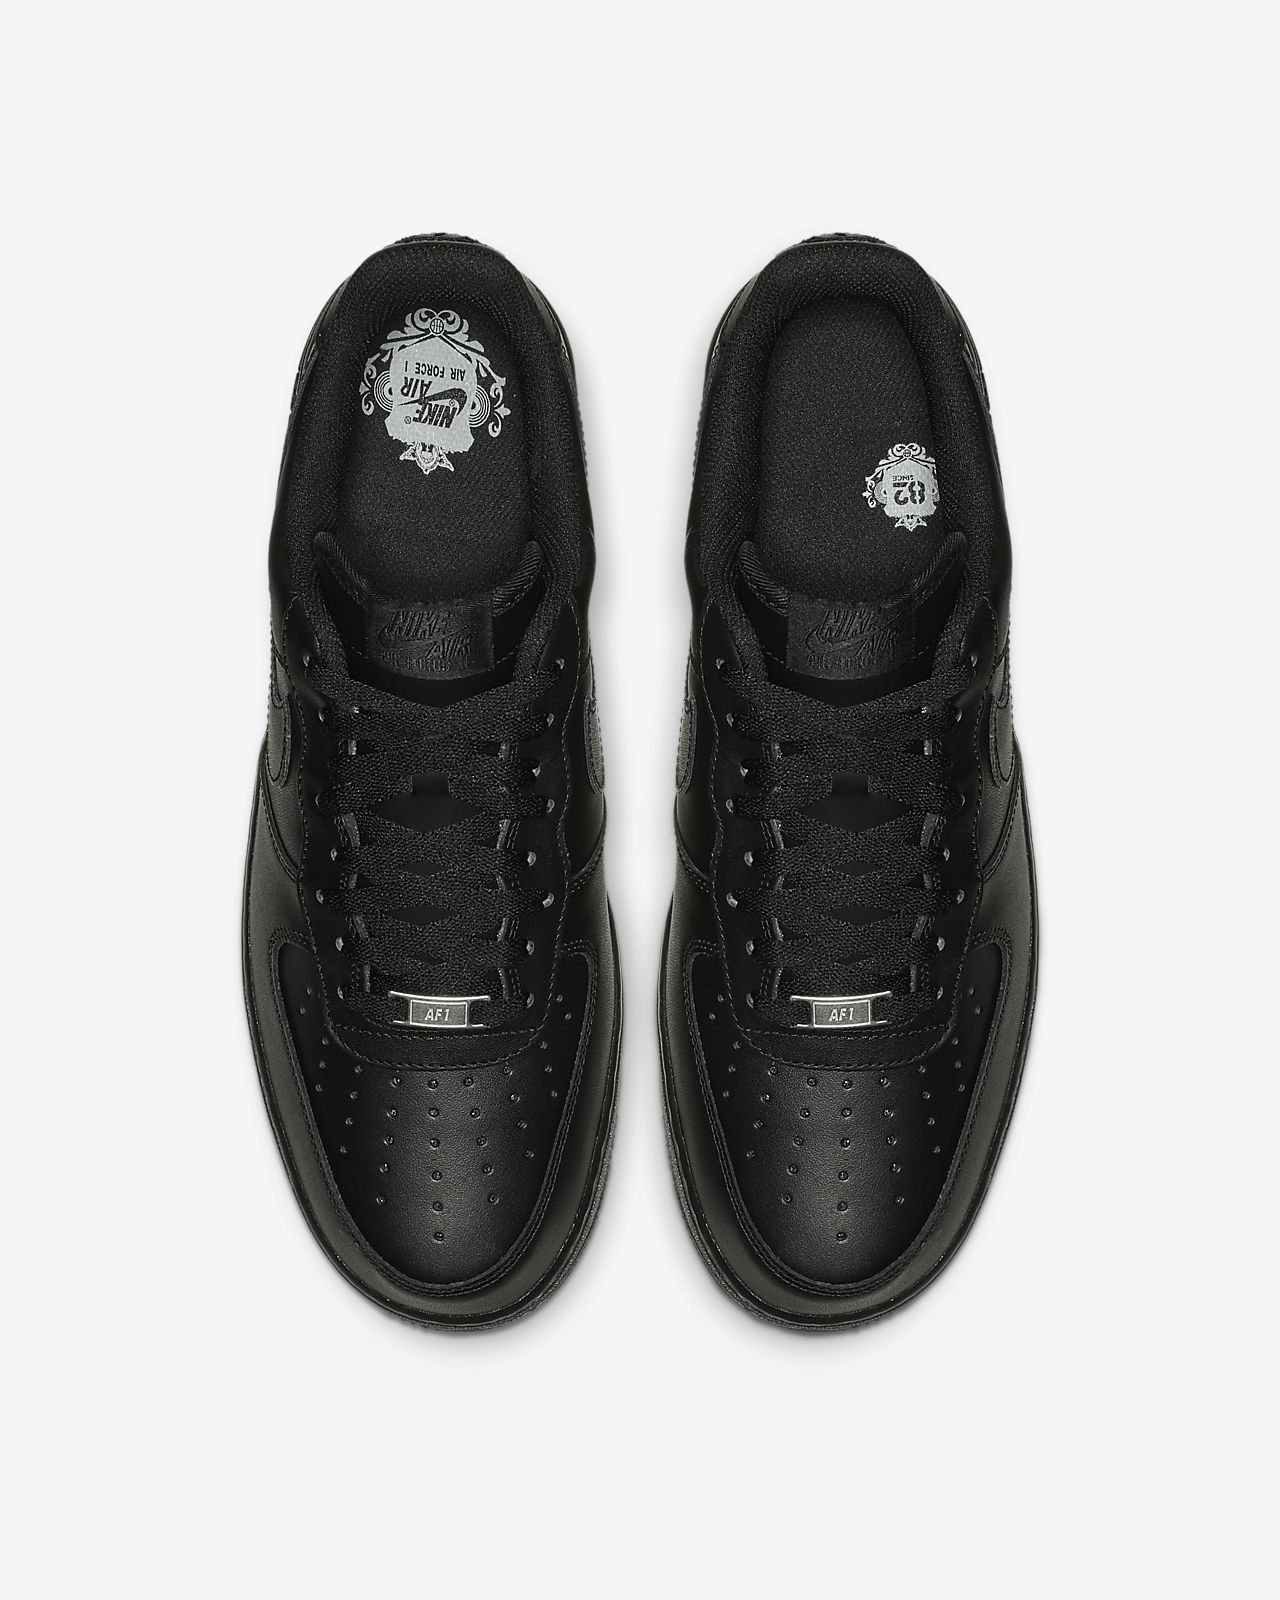 Nike Sportswear Air Force 1 07 Scarpe Uomo Nero 315122 001